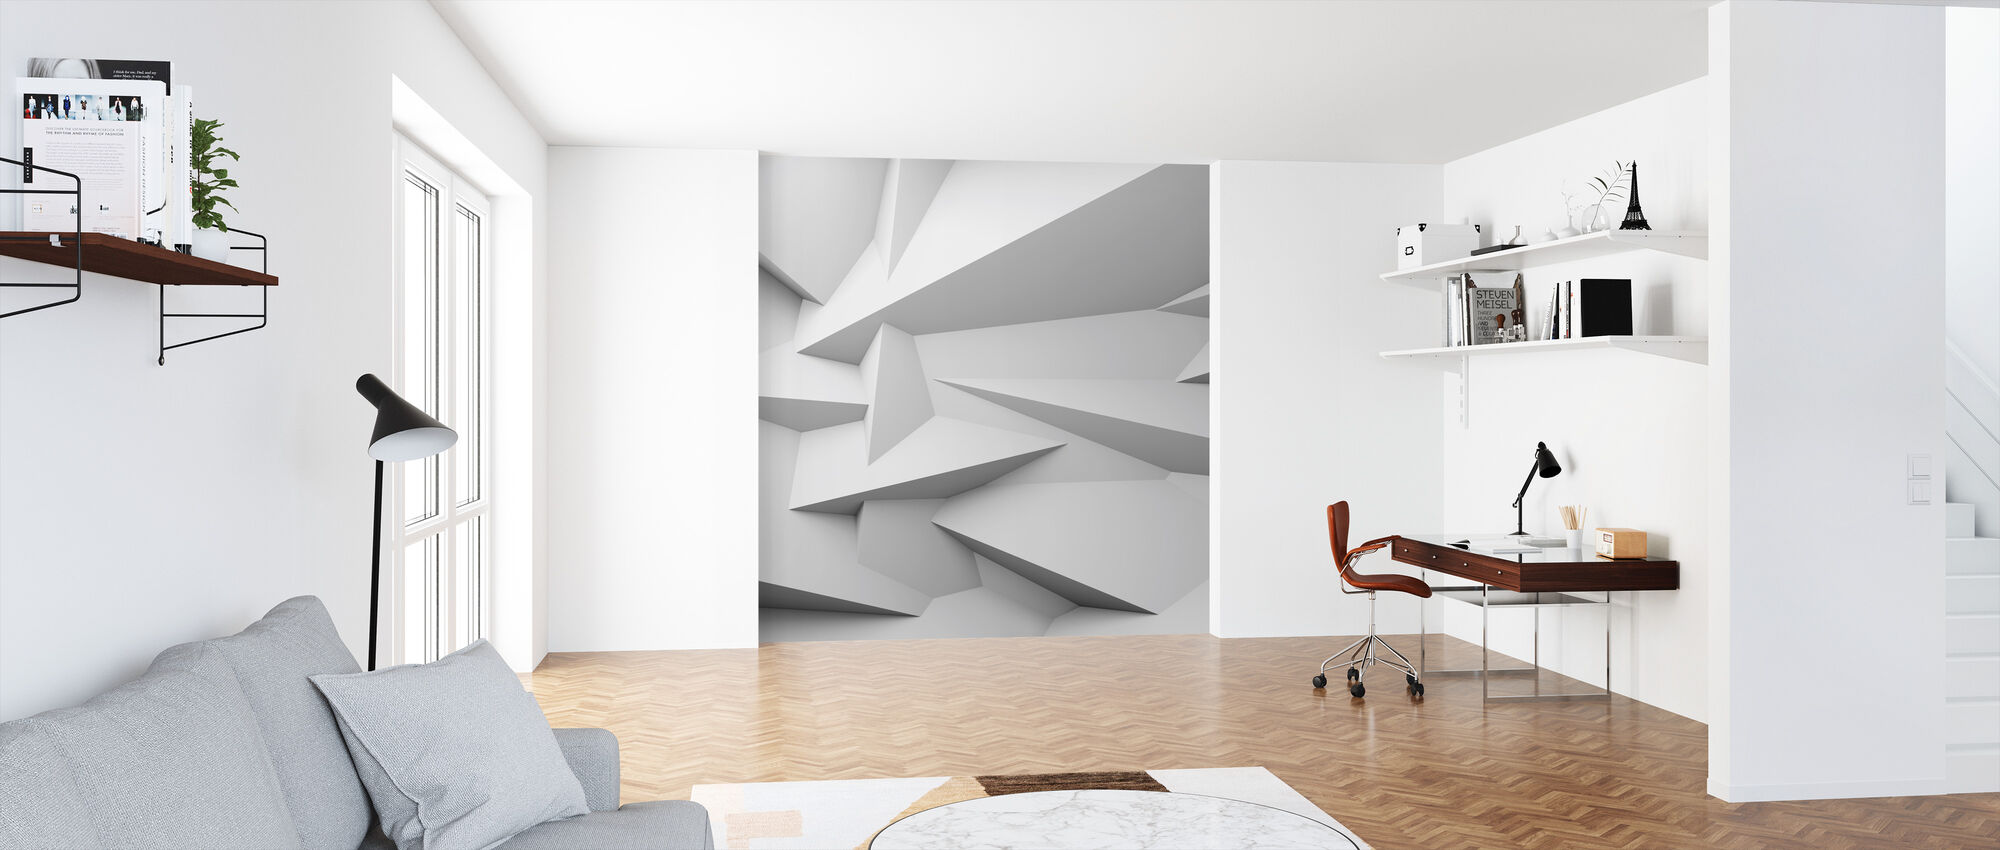 Facettierte 3D Wand - Tapete - Büro